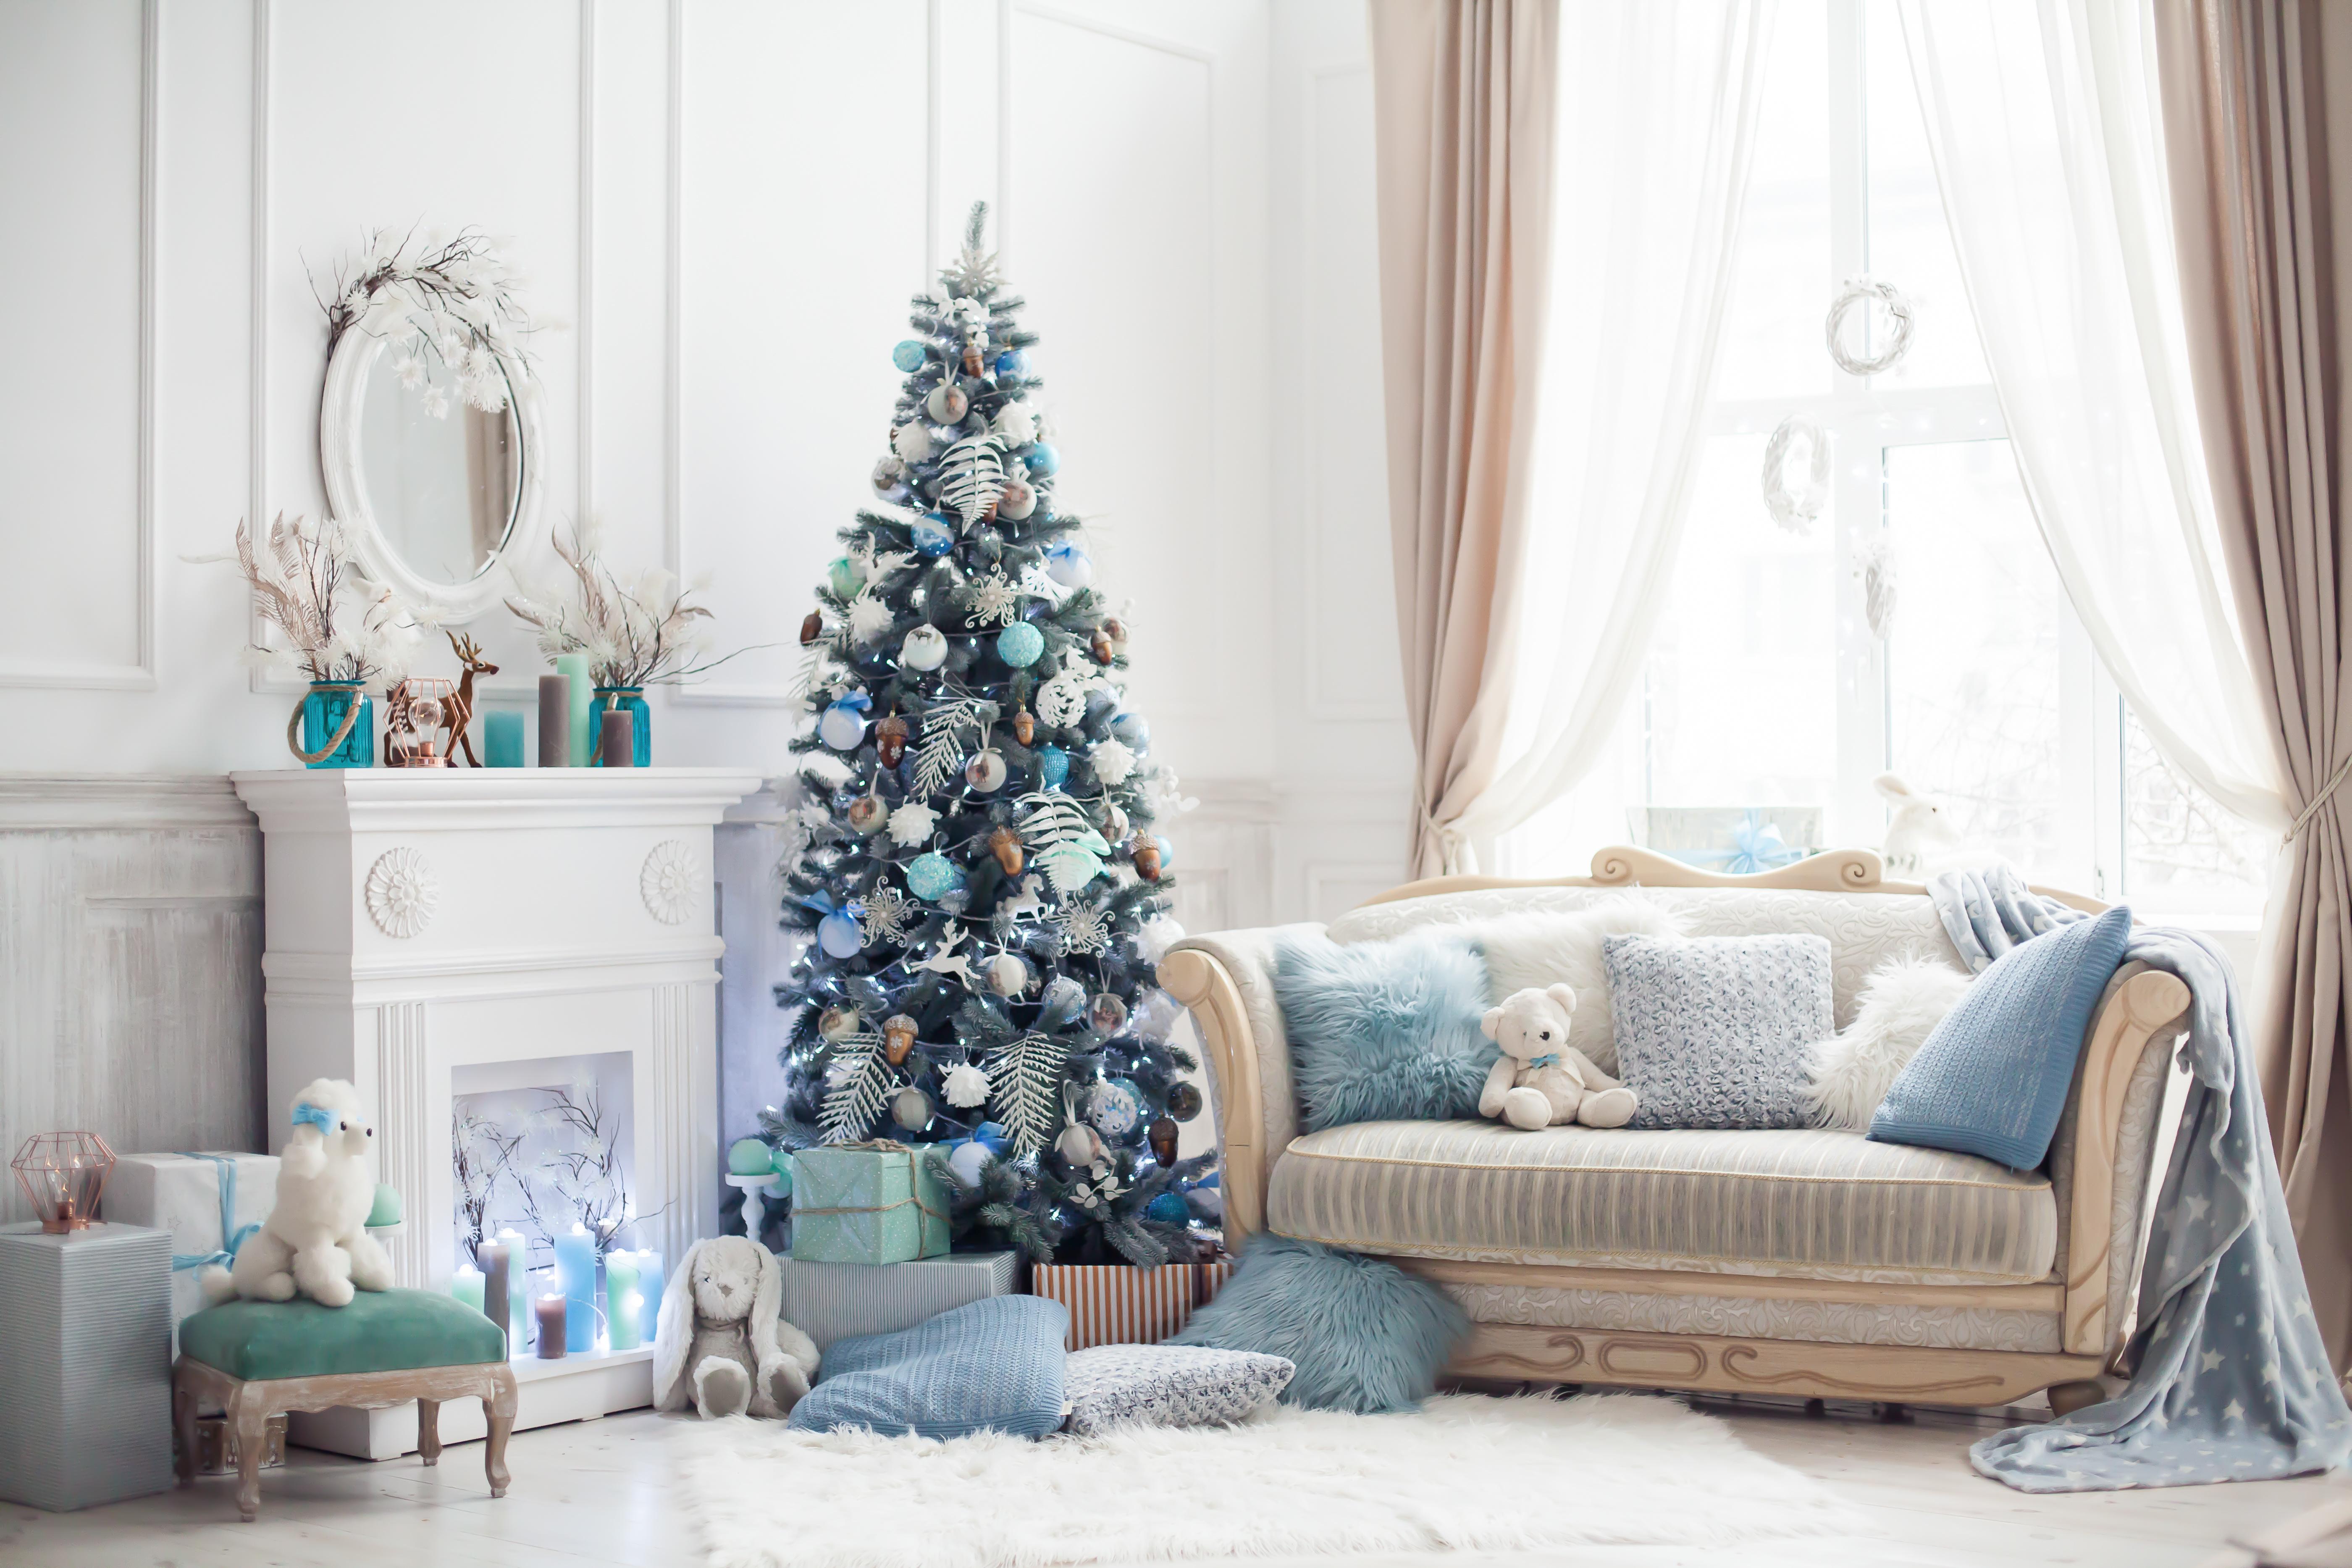 A Tree-mendous Christmas!